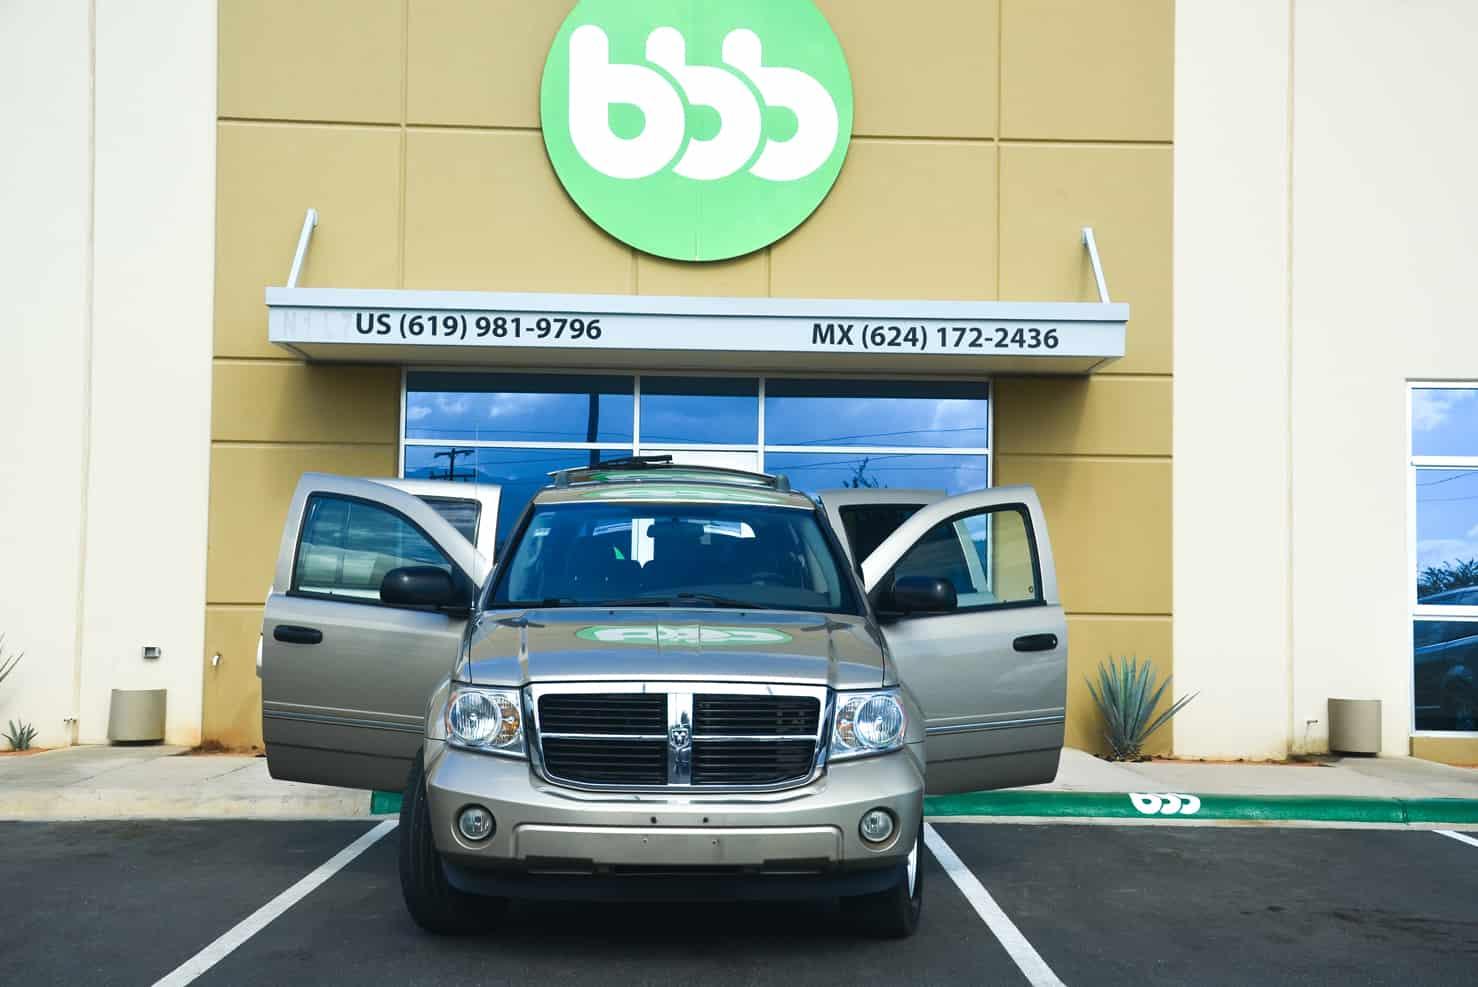 Dodge Durango | BBB Rent a Car | Los Cabos, Mexico